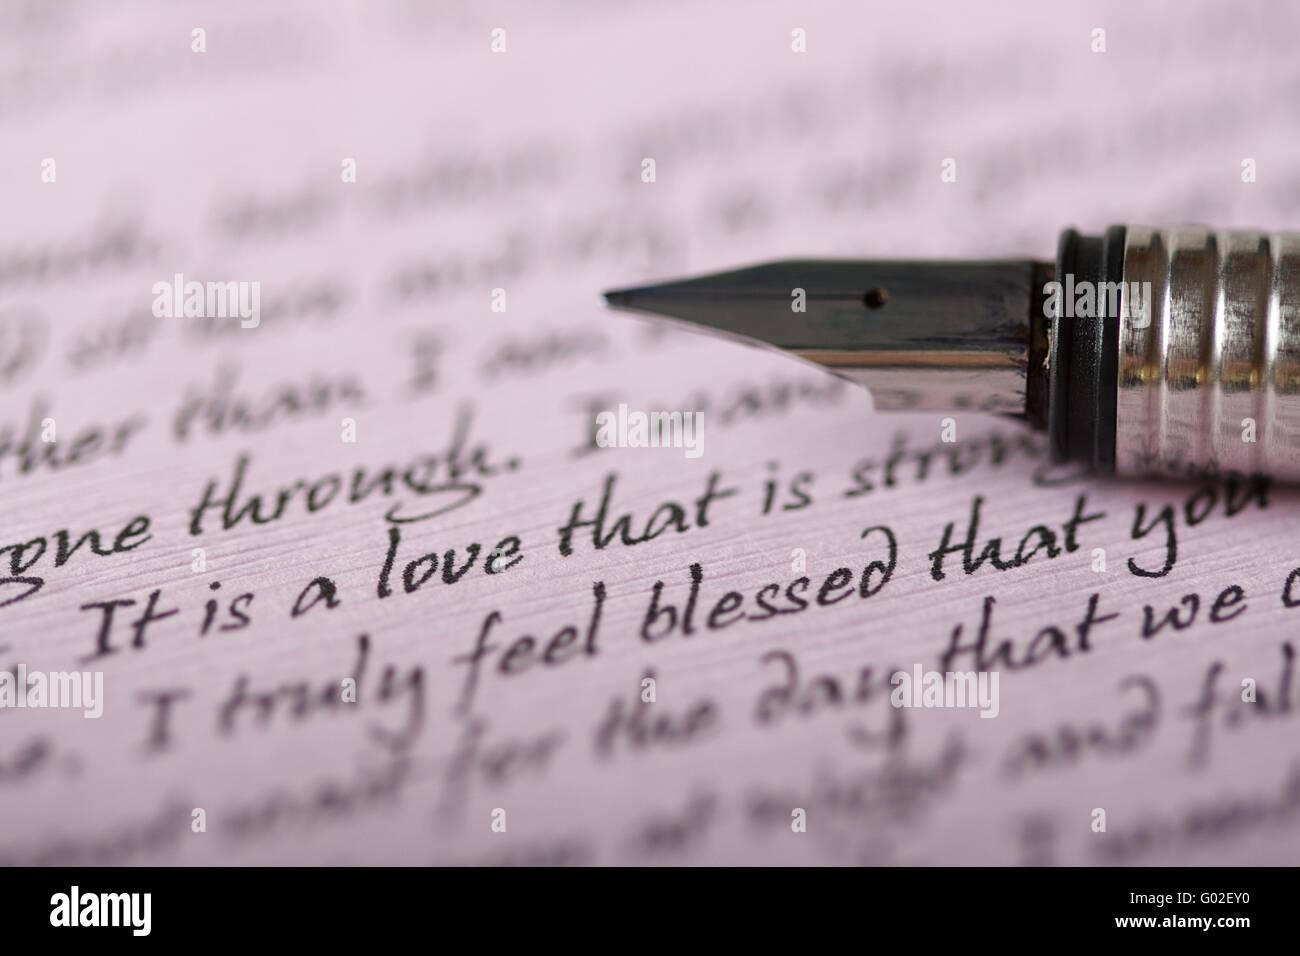 A pen on a love letter written on purple paper stock photo a pen on a love letter written on purple paper altavistaventures Gallery